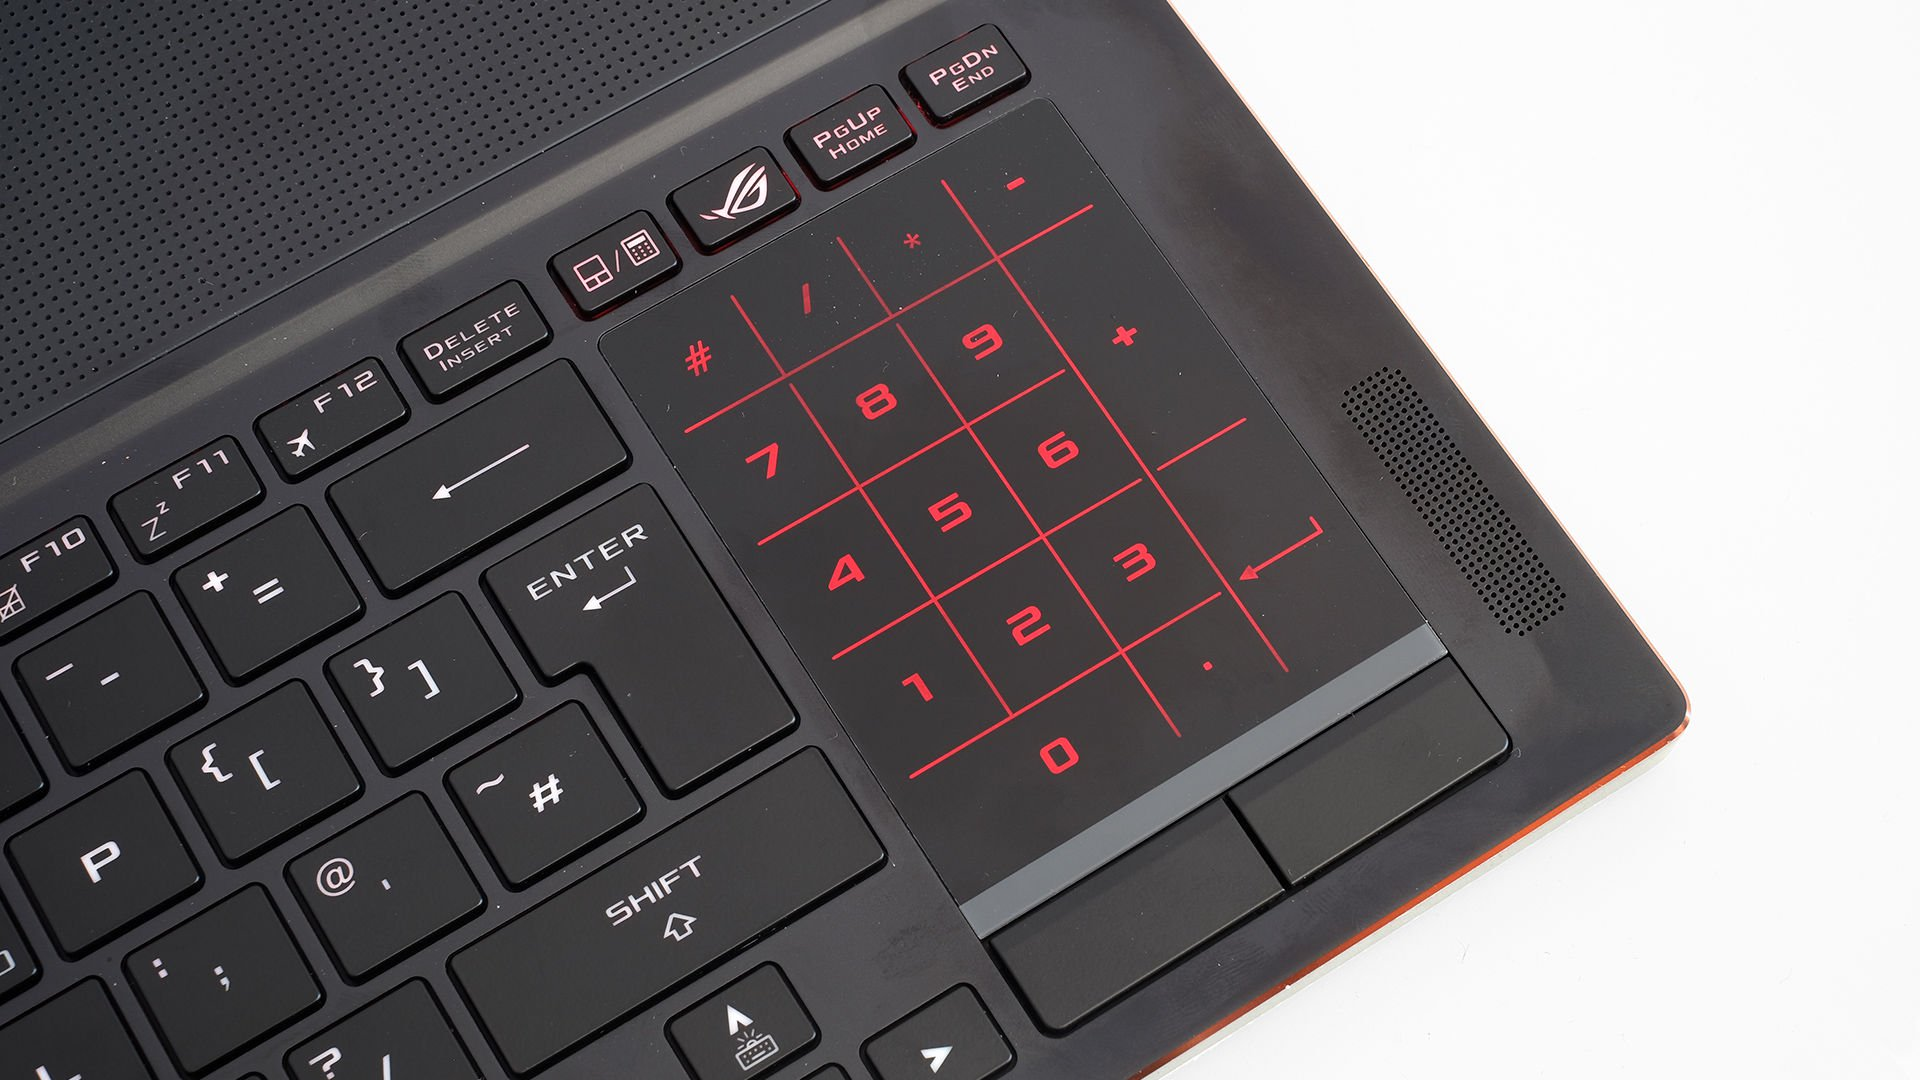 Asus ROG Zephyrus GX501 trackpad